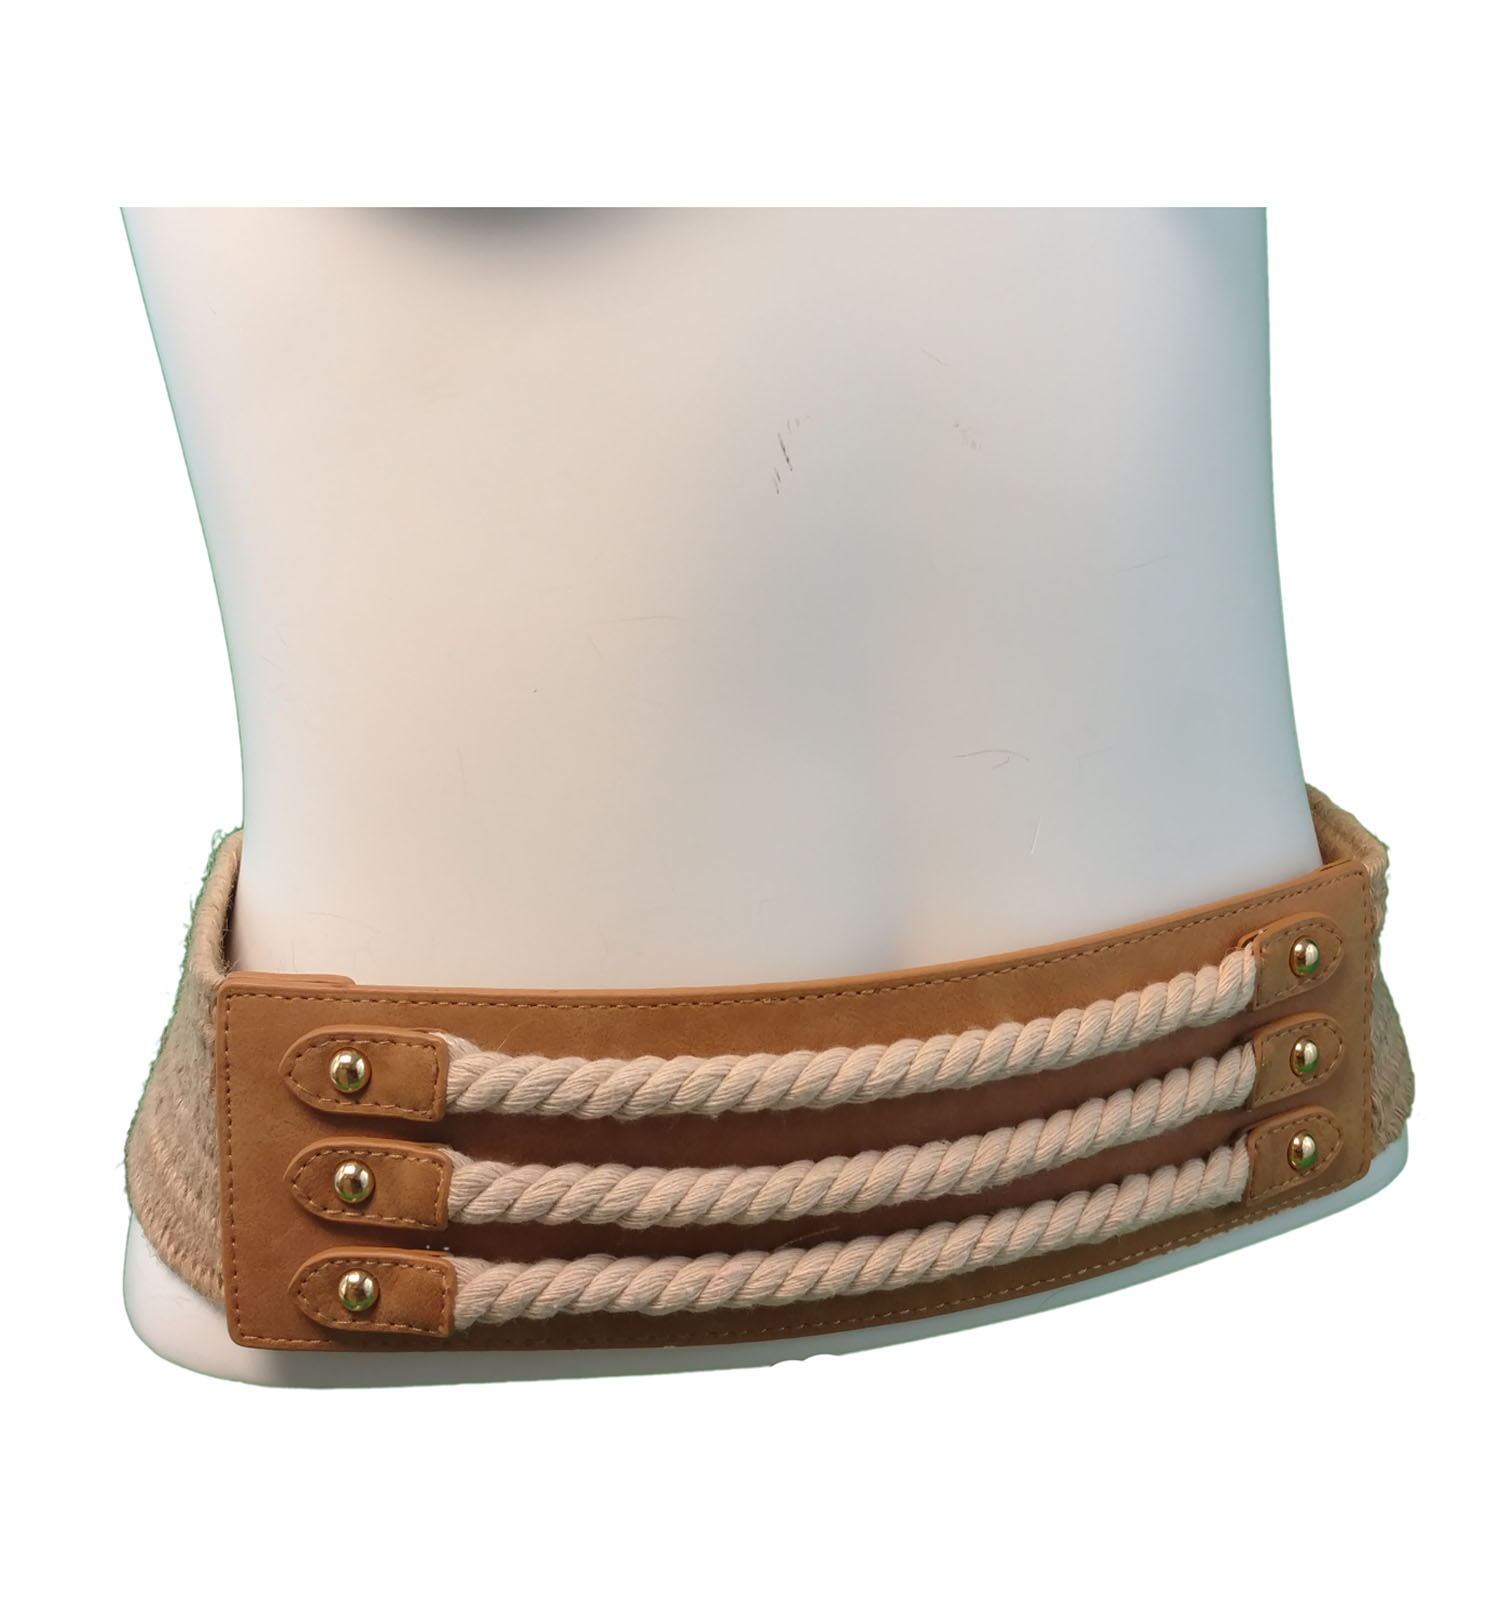 67e61fee3 Via Spiga Nautical Rope Tan Hemp Stretch Belt Size Extra Large XL 35